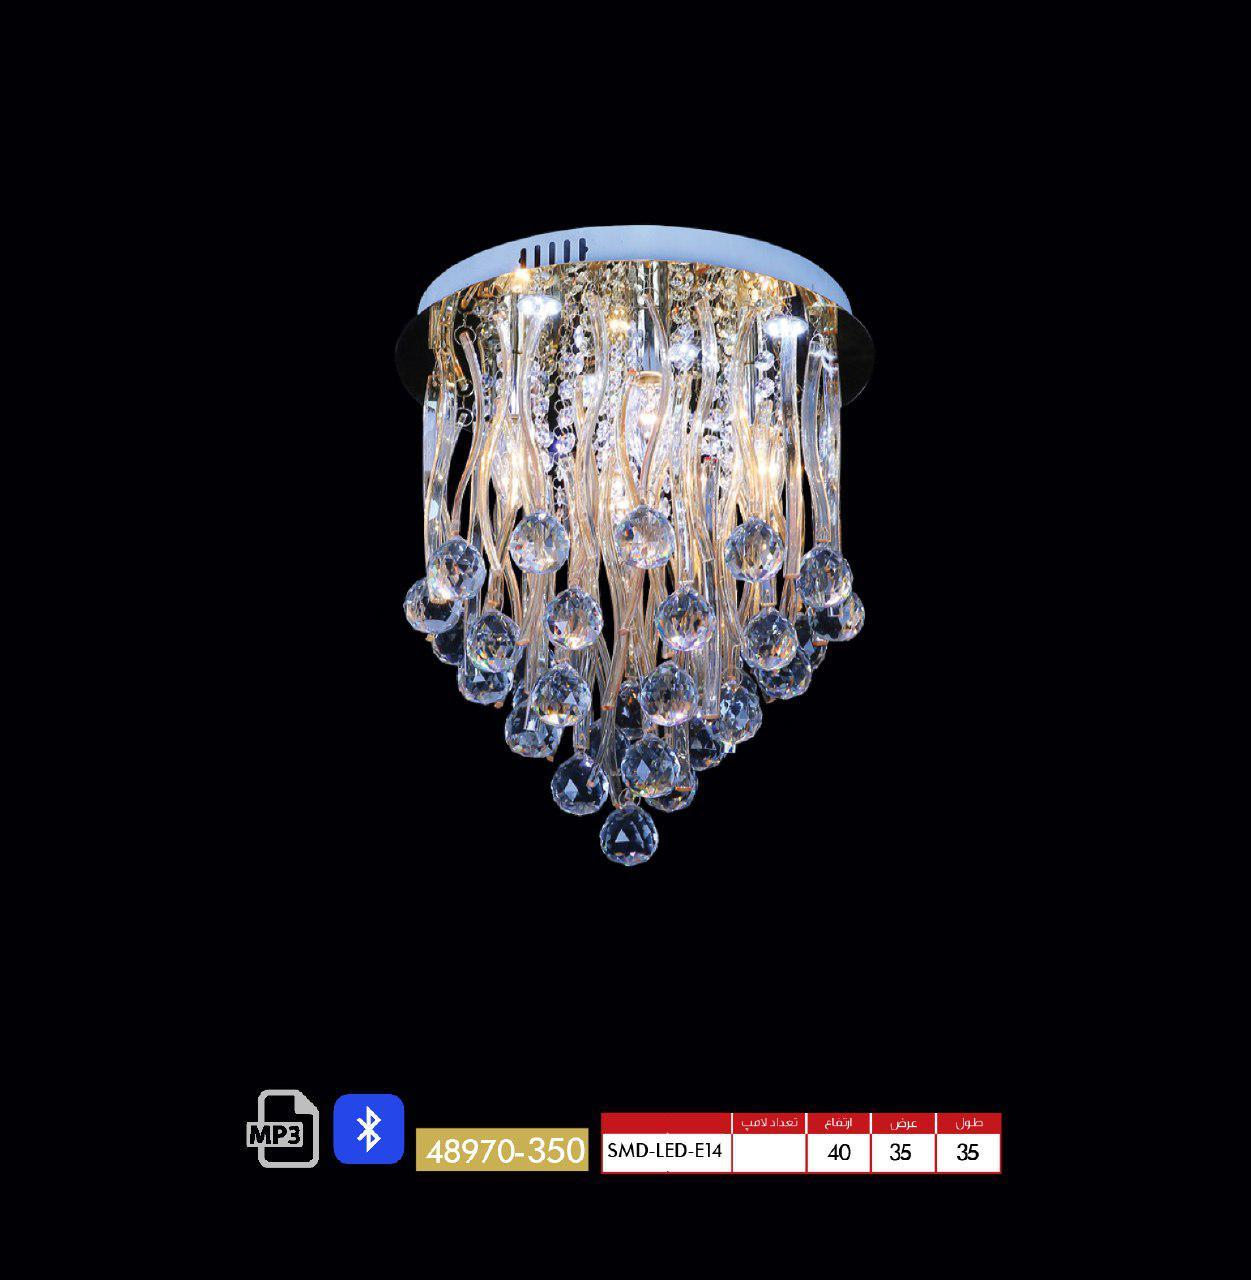 لوستر سقفی LED (کد: ۳۵۰/ ۴۸۹۷۰)  